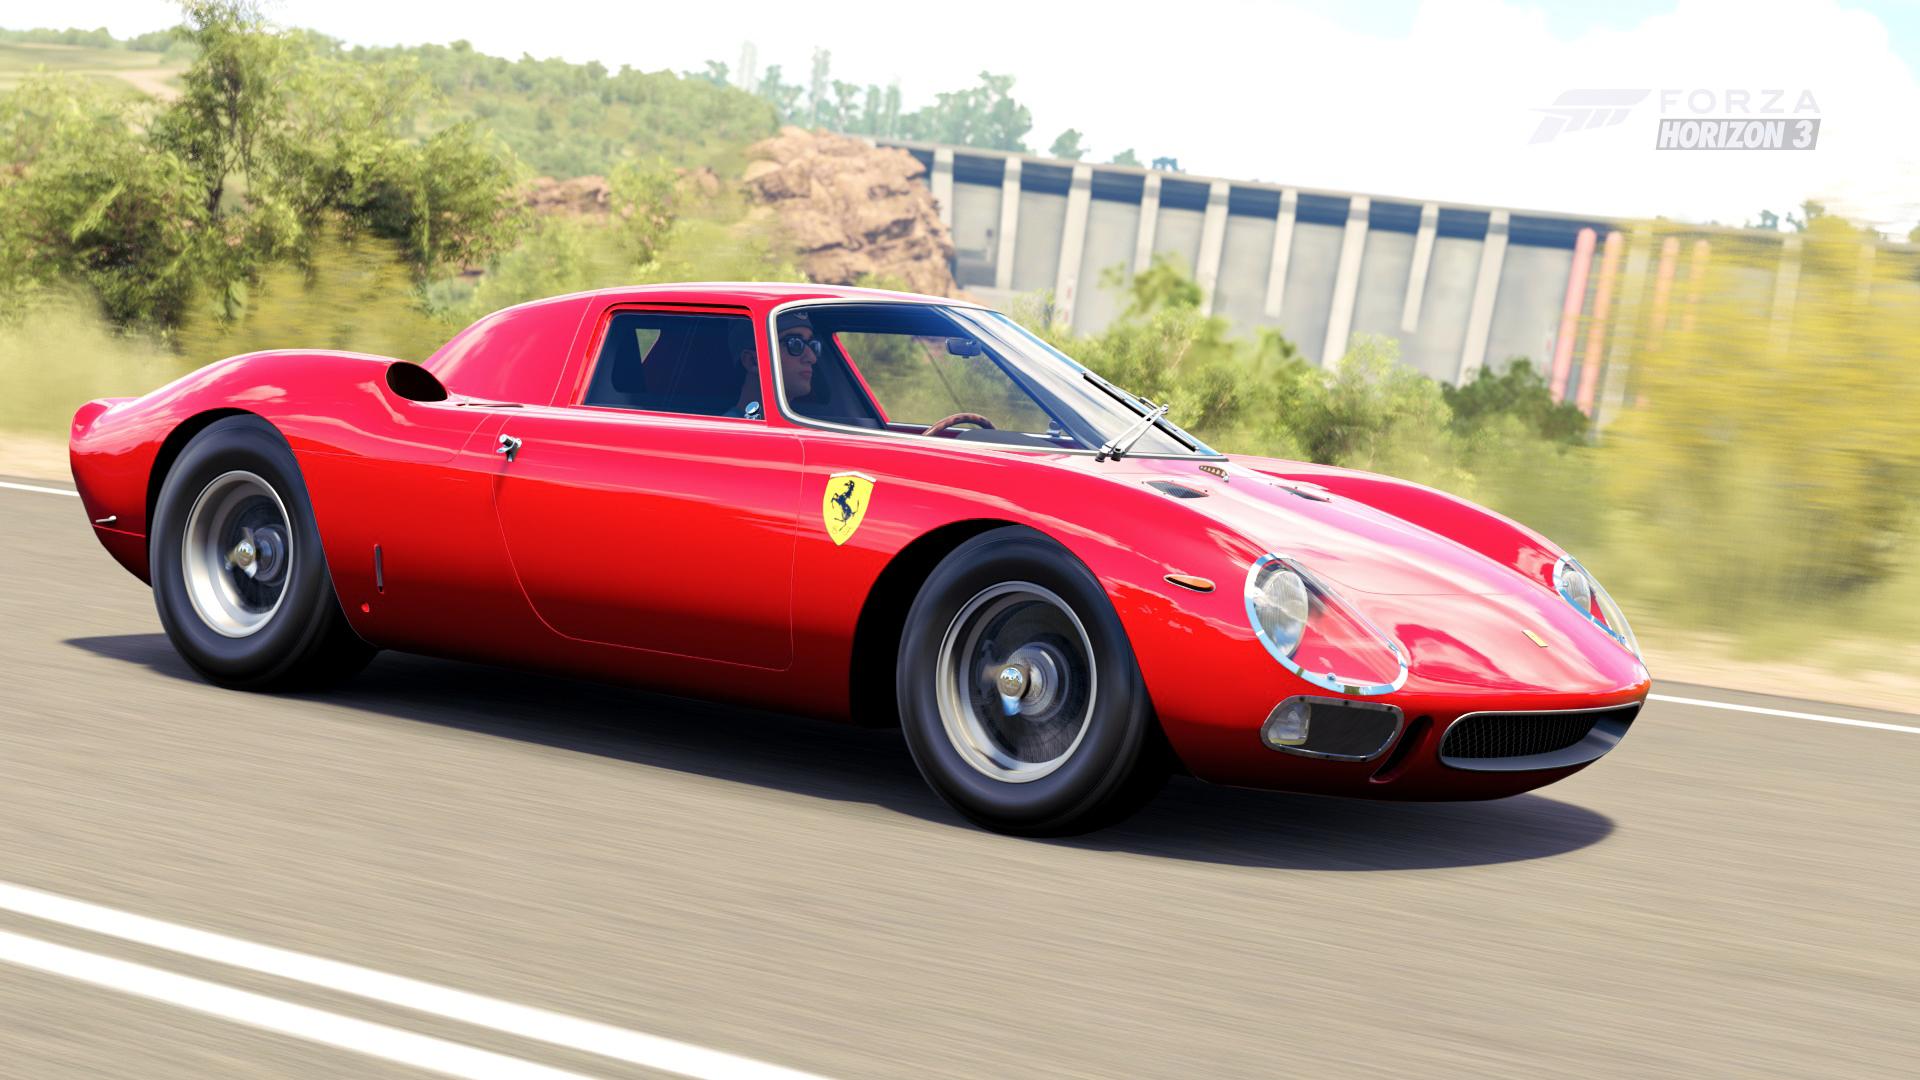 c16abd3d-1f29-4ea0-a4b8-c69ef10905b2.png?n=1965%20Ferrari%20250LM%20DJ%20Lime Fabulous Ferrari Mondial 8 Super Elite Cars Trend